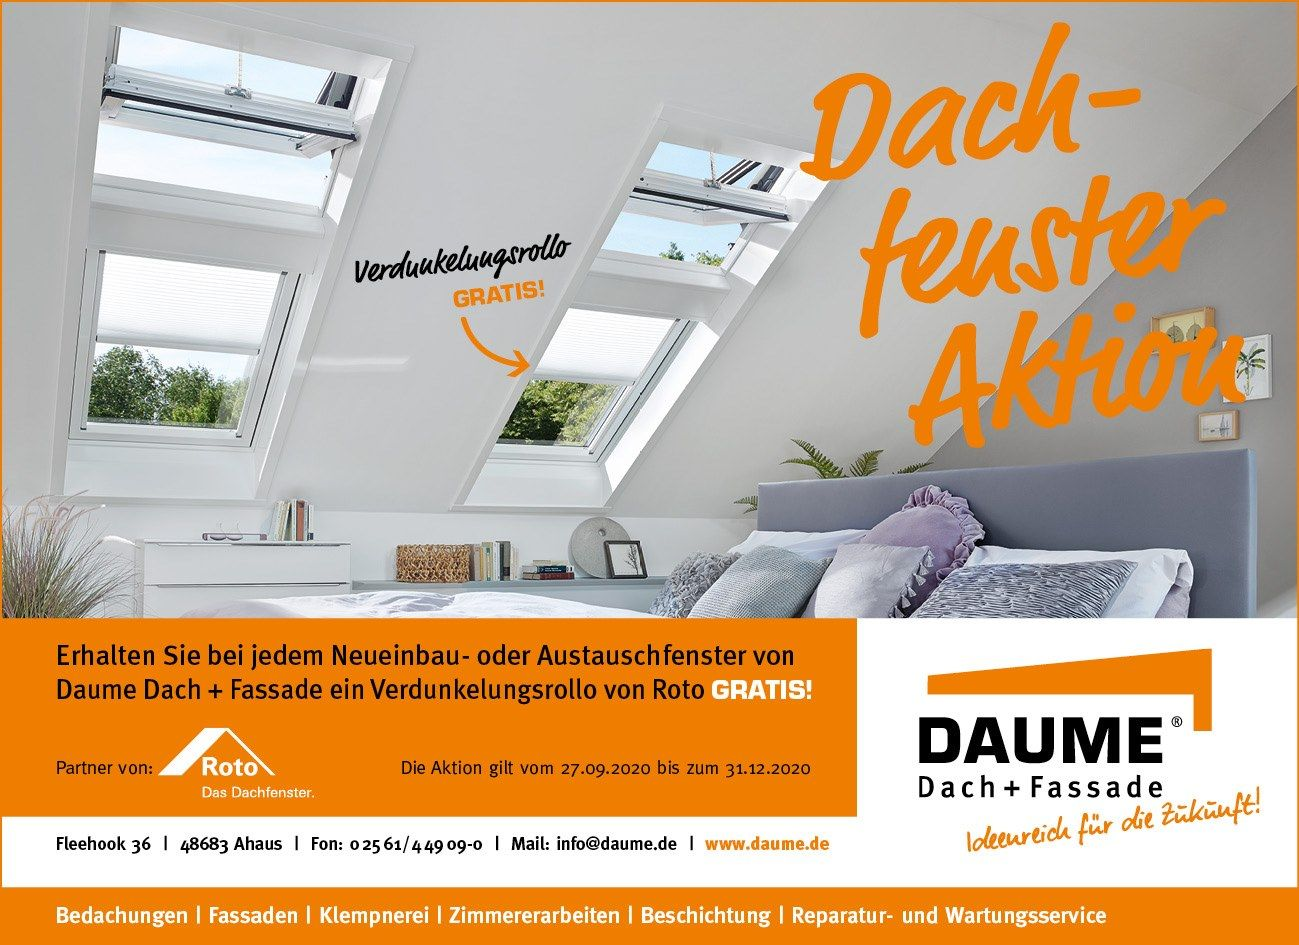 Aktuell   Helmut Daume Dach + Fassade